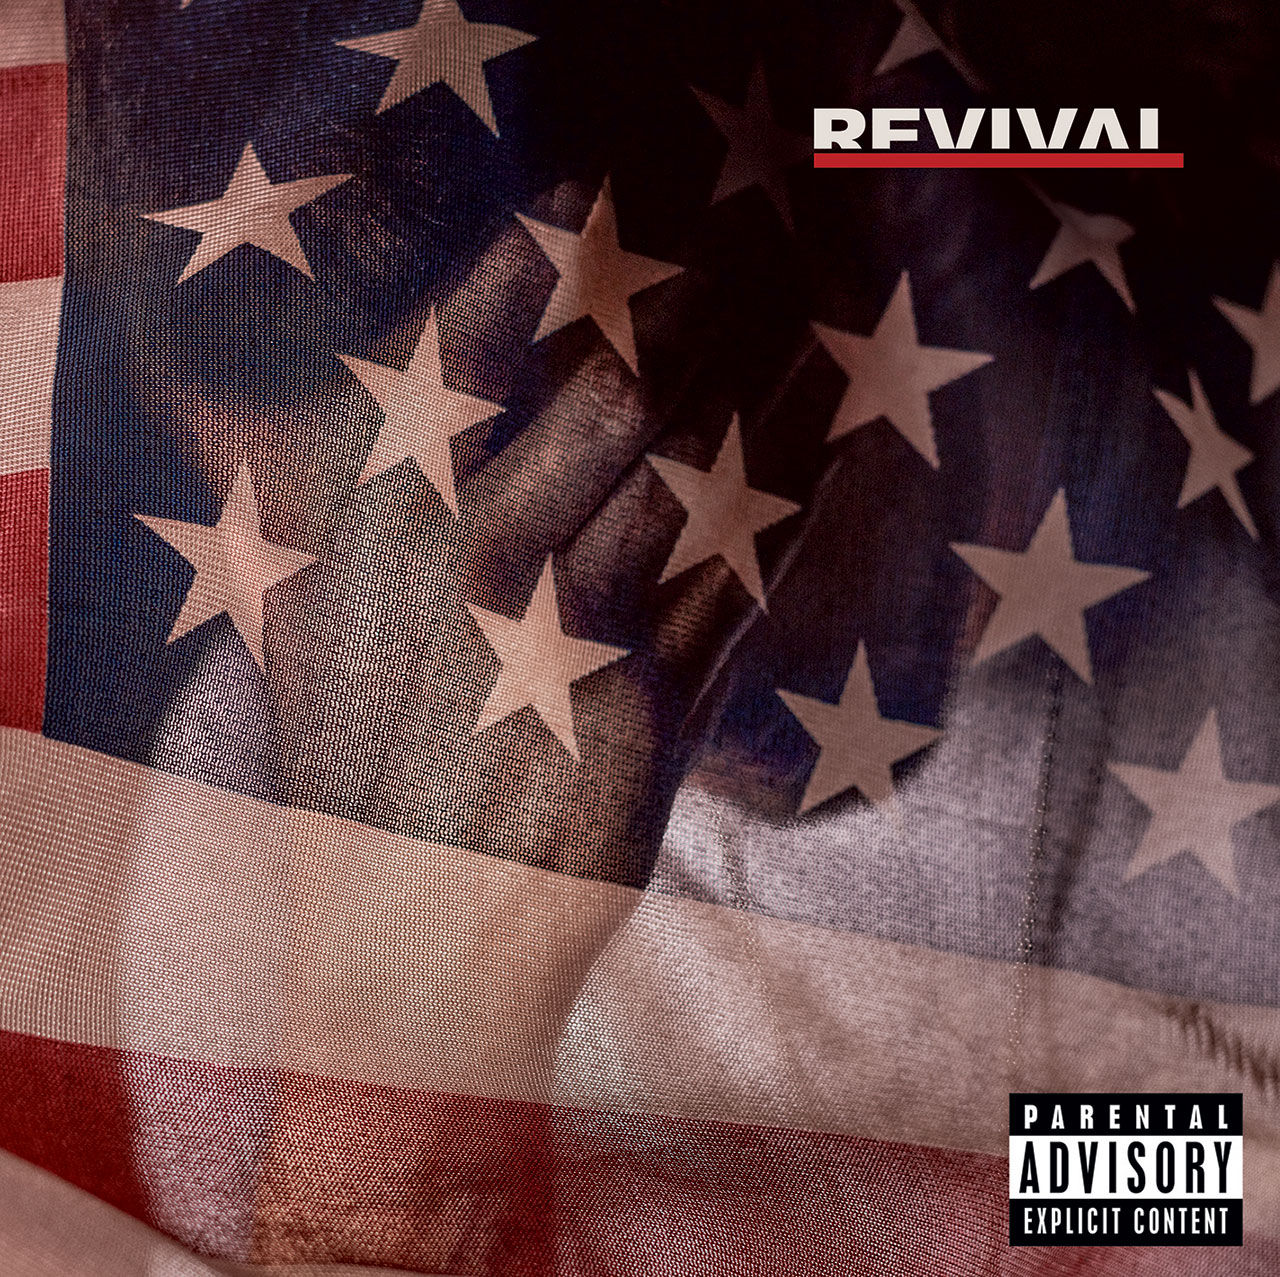 Lyssna på Eminems nya album Revival